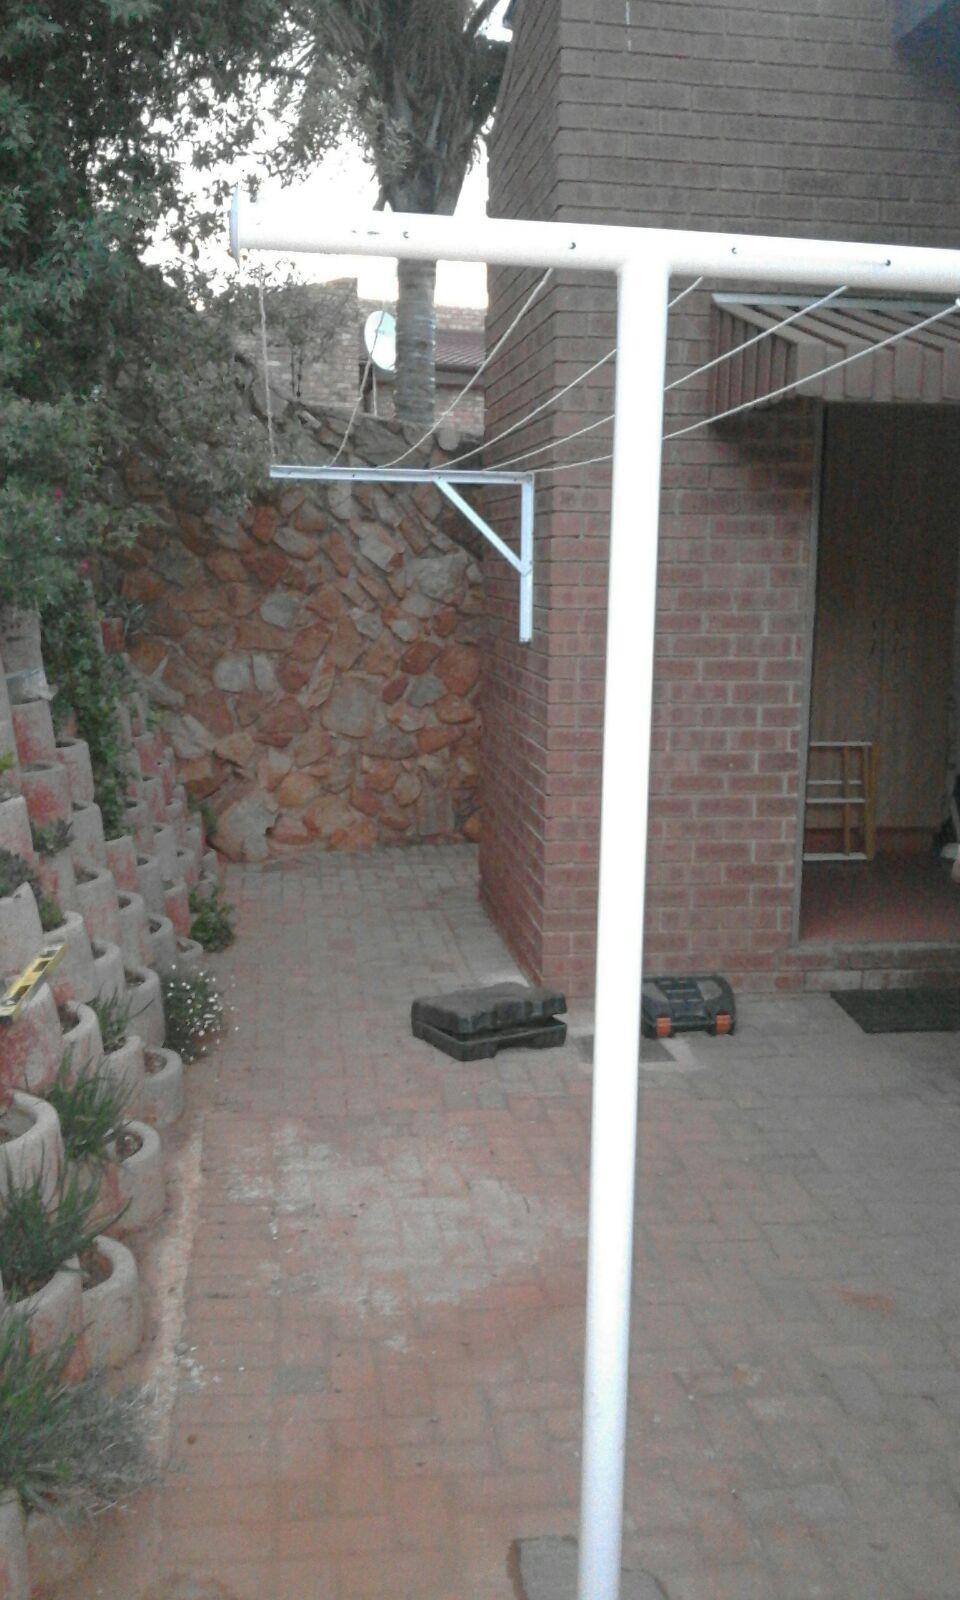 Foto de NW Washing Lines Johannesburg